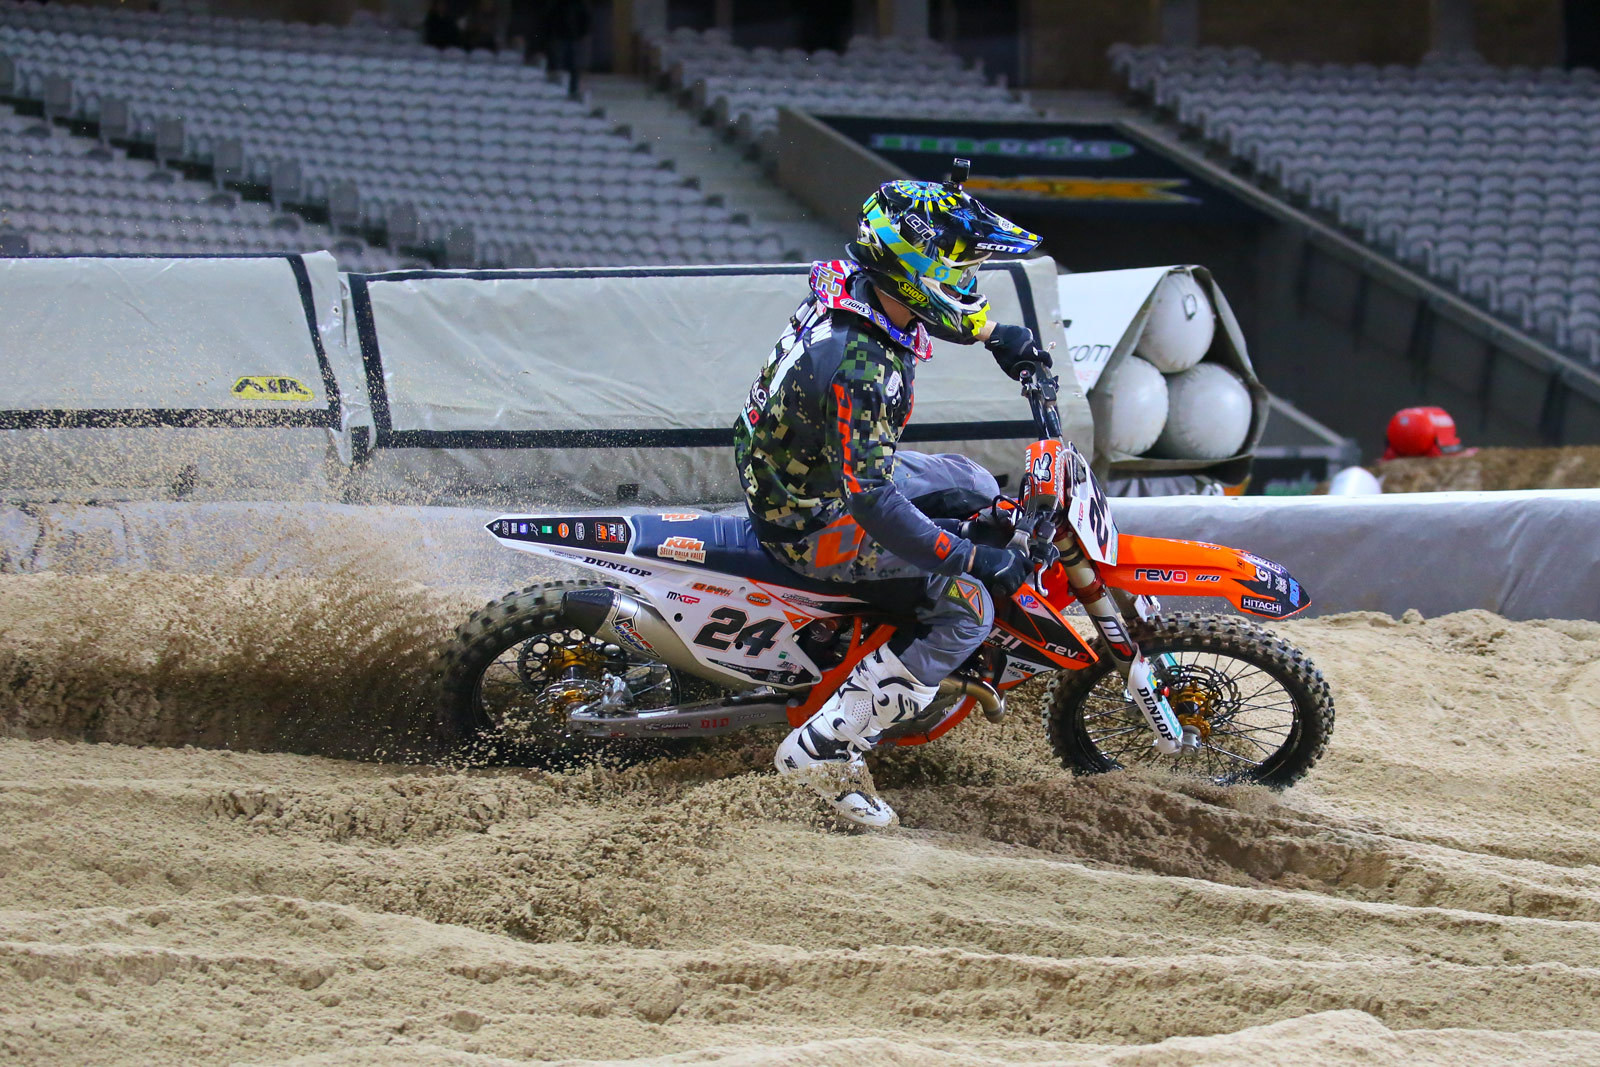 Shaun Simpson - Supercross Paris-Lille: Press Day - Motocross Pictures - Vital MX